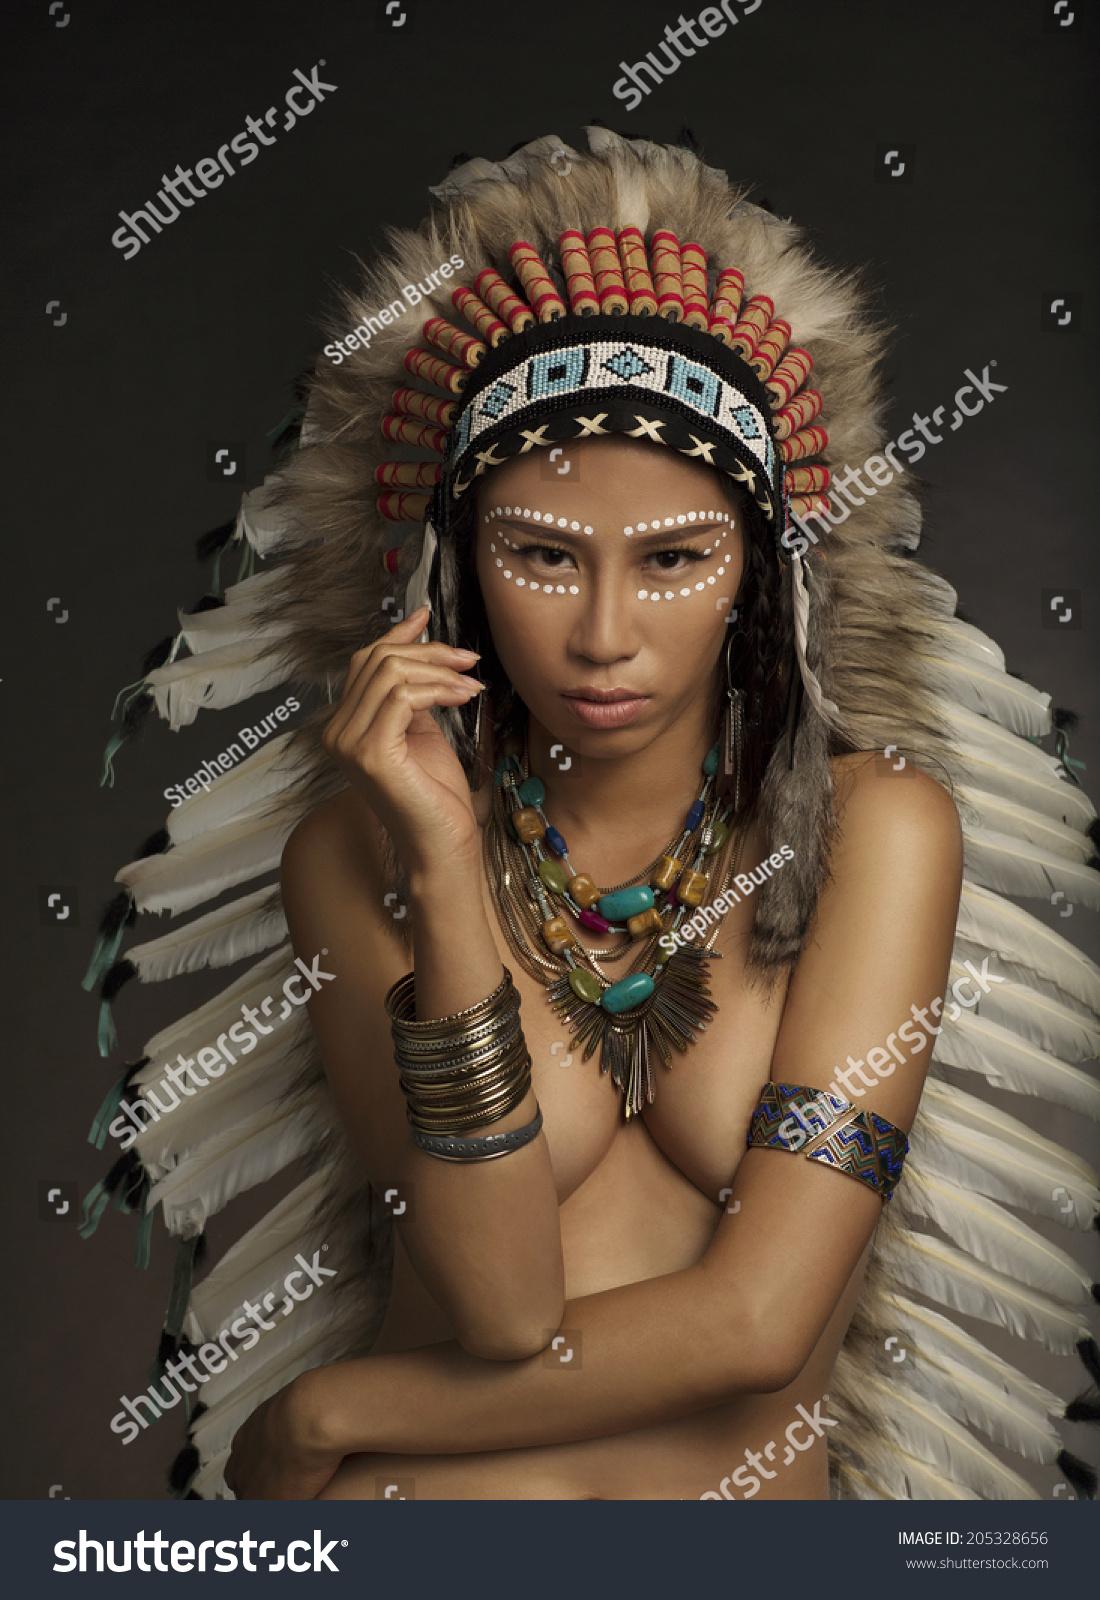 Indian Girl Face Paint Ideas Wwwgalleryhipcom The